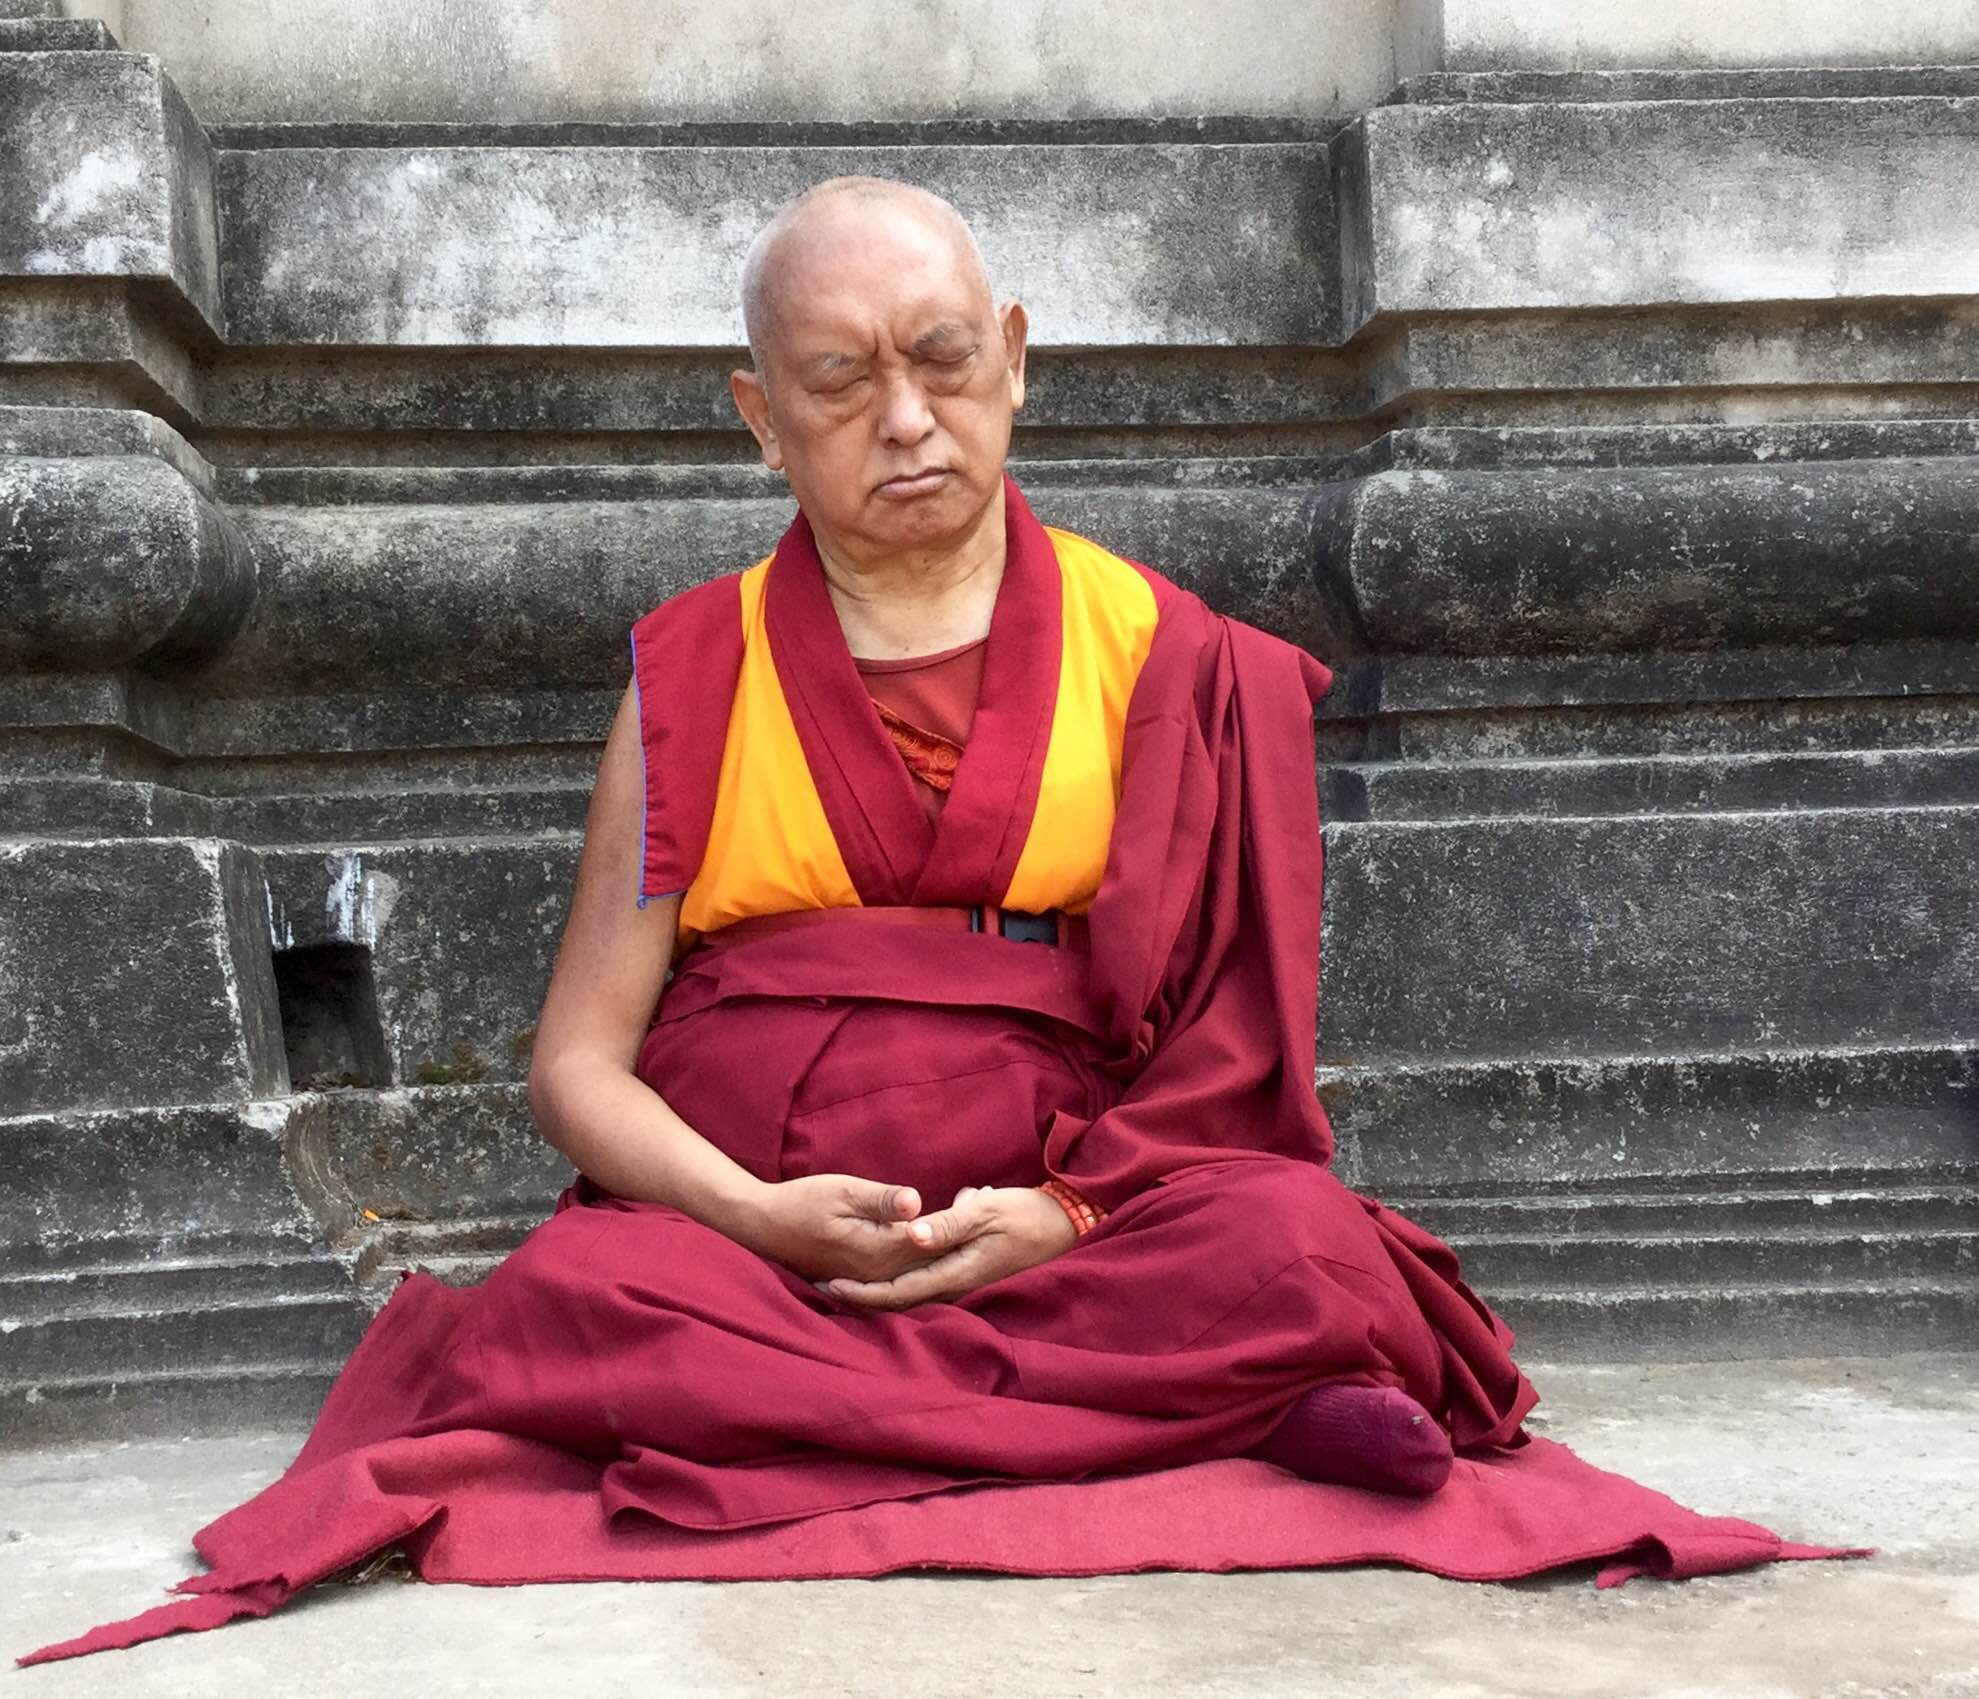 Lama Zopa Rinpoche meditating at the Mahabodhi Stupa in Bodhgaya, 2015. (Photo Ven Sarah Thresher)